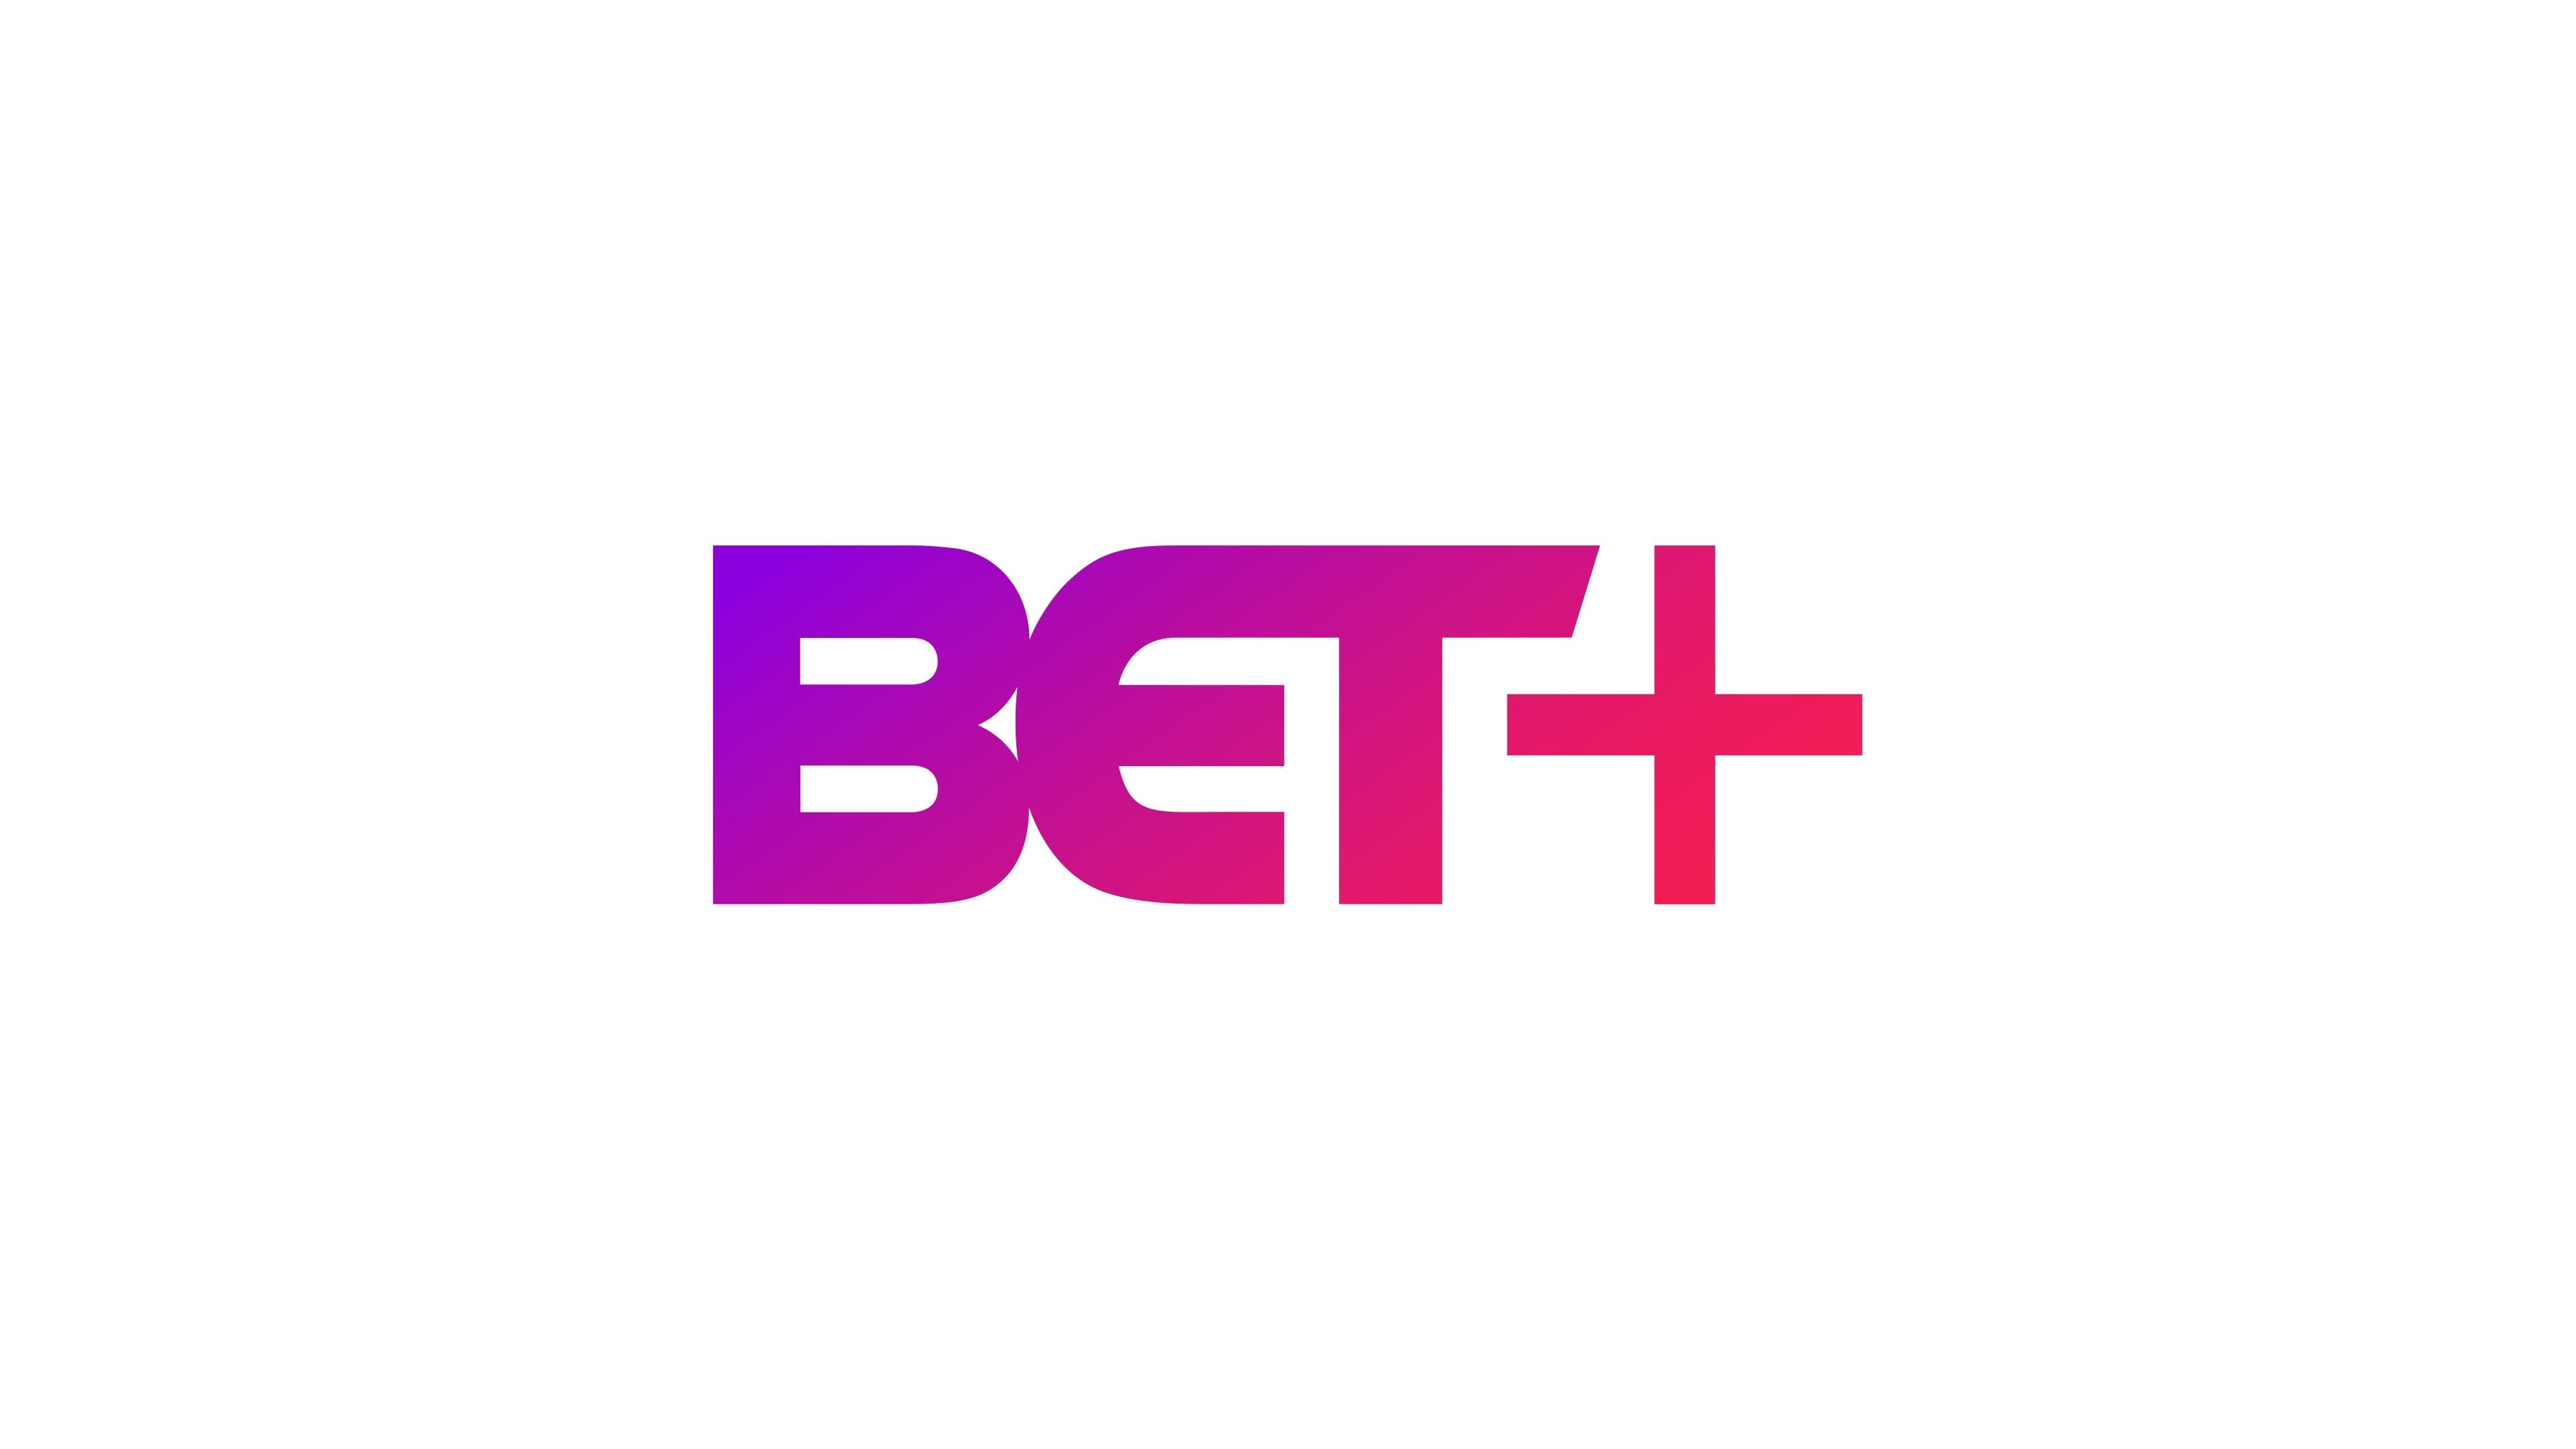 Free Bet App